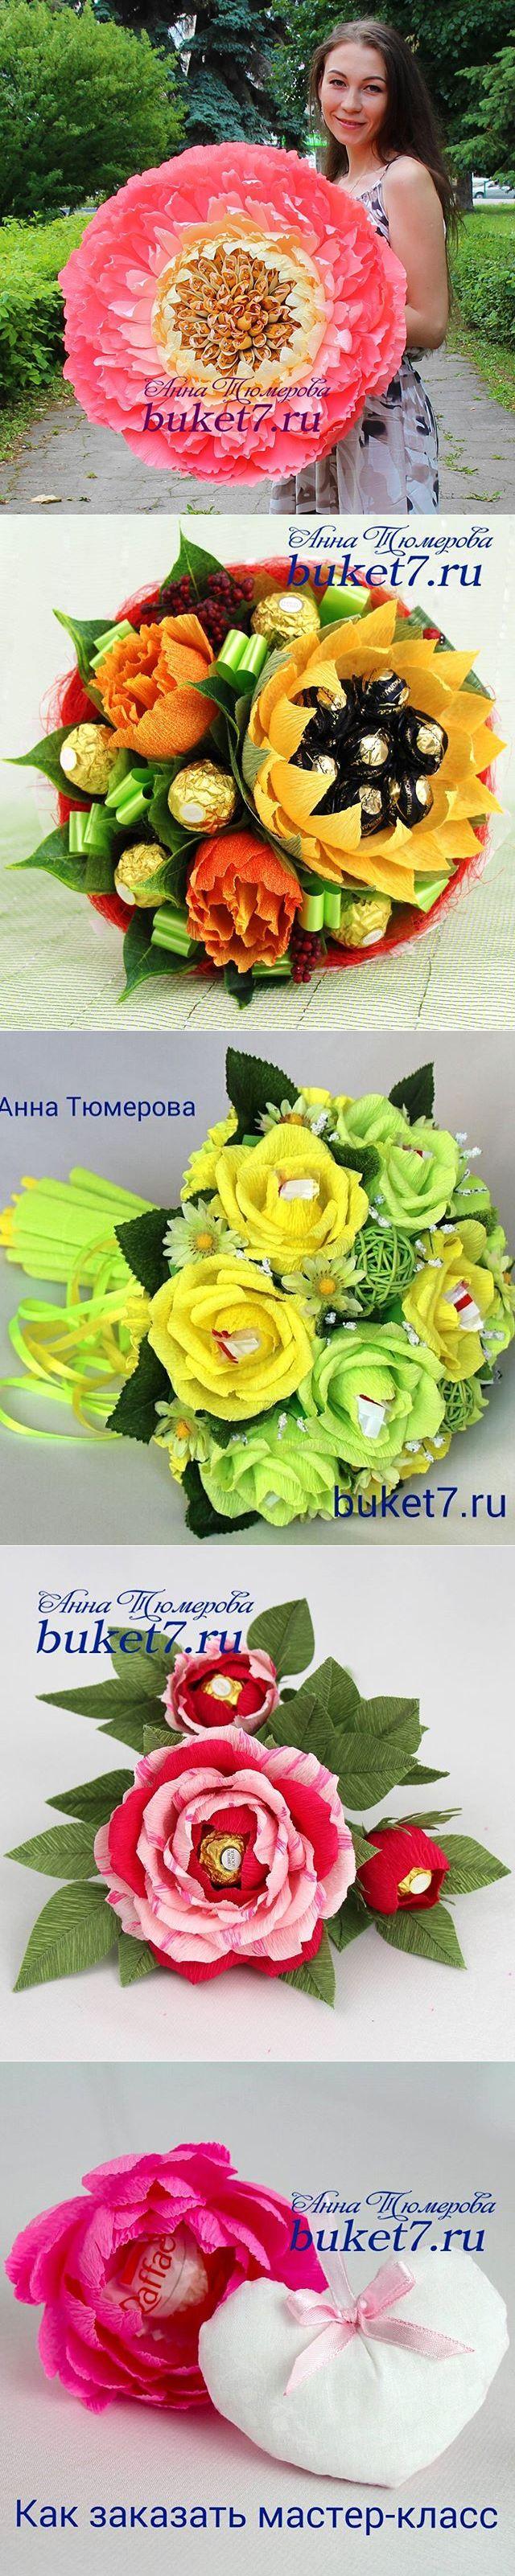 Anna Tyumerova (@buket7.ru) • Фото и видео в Instagram